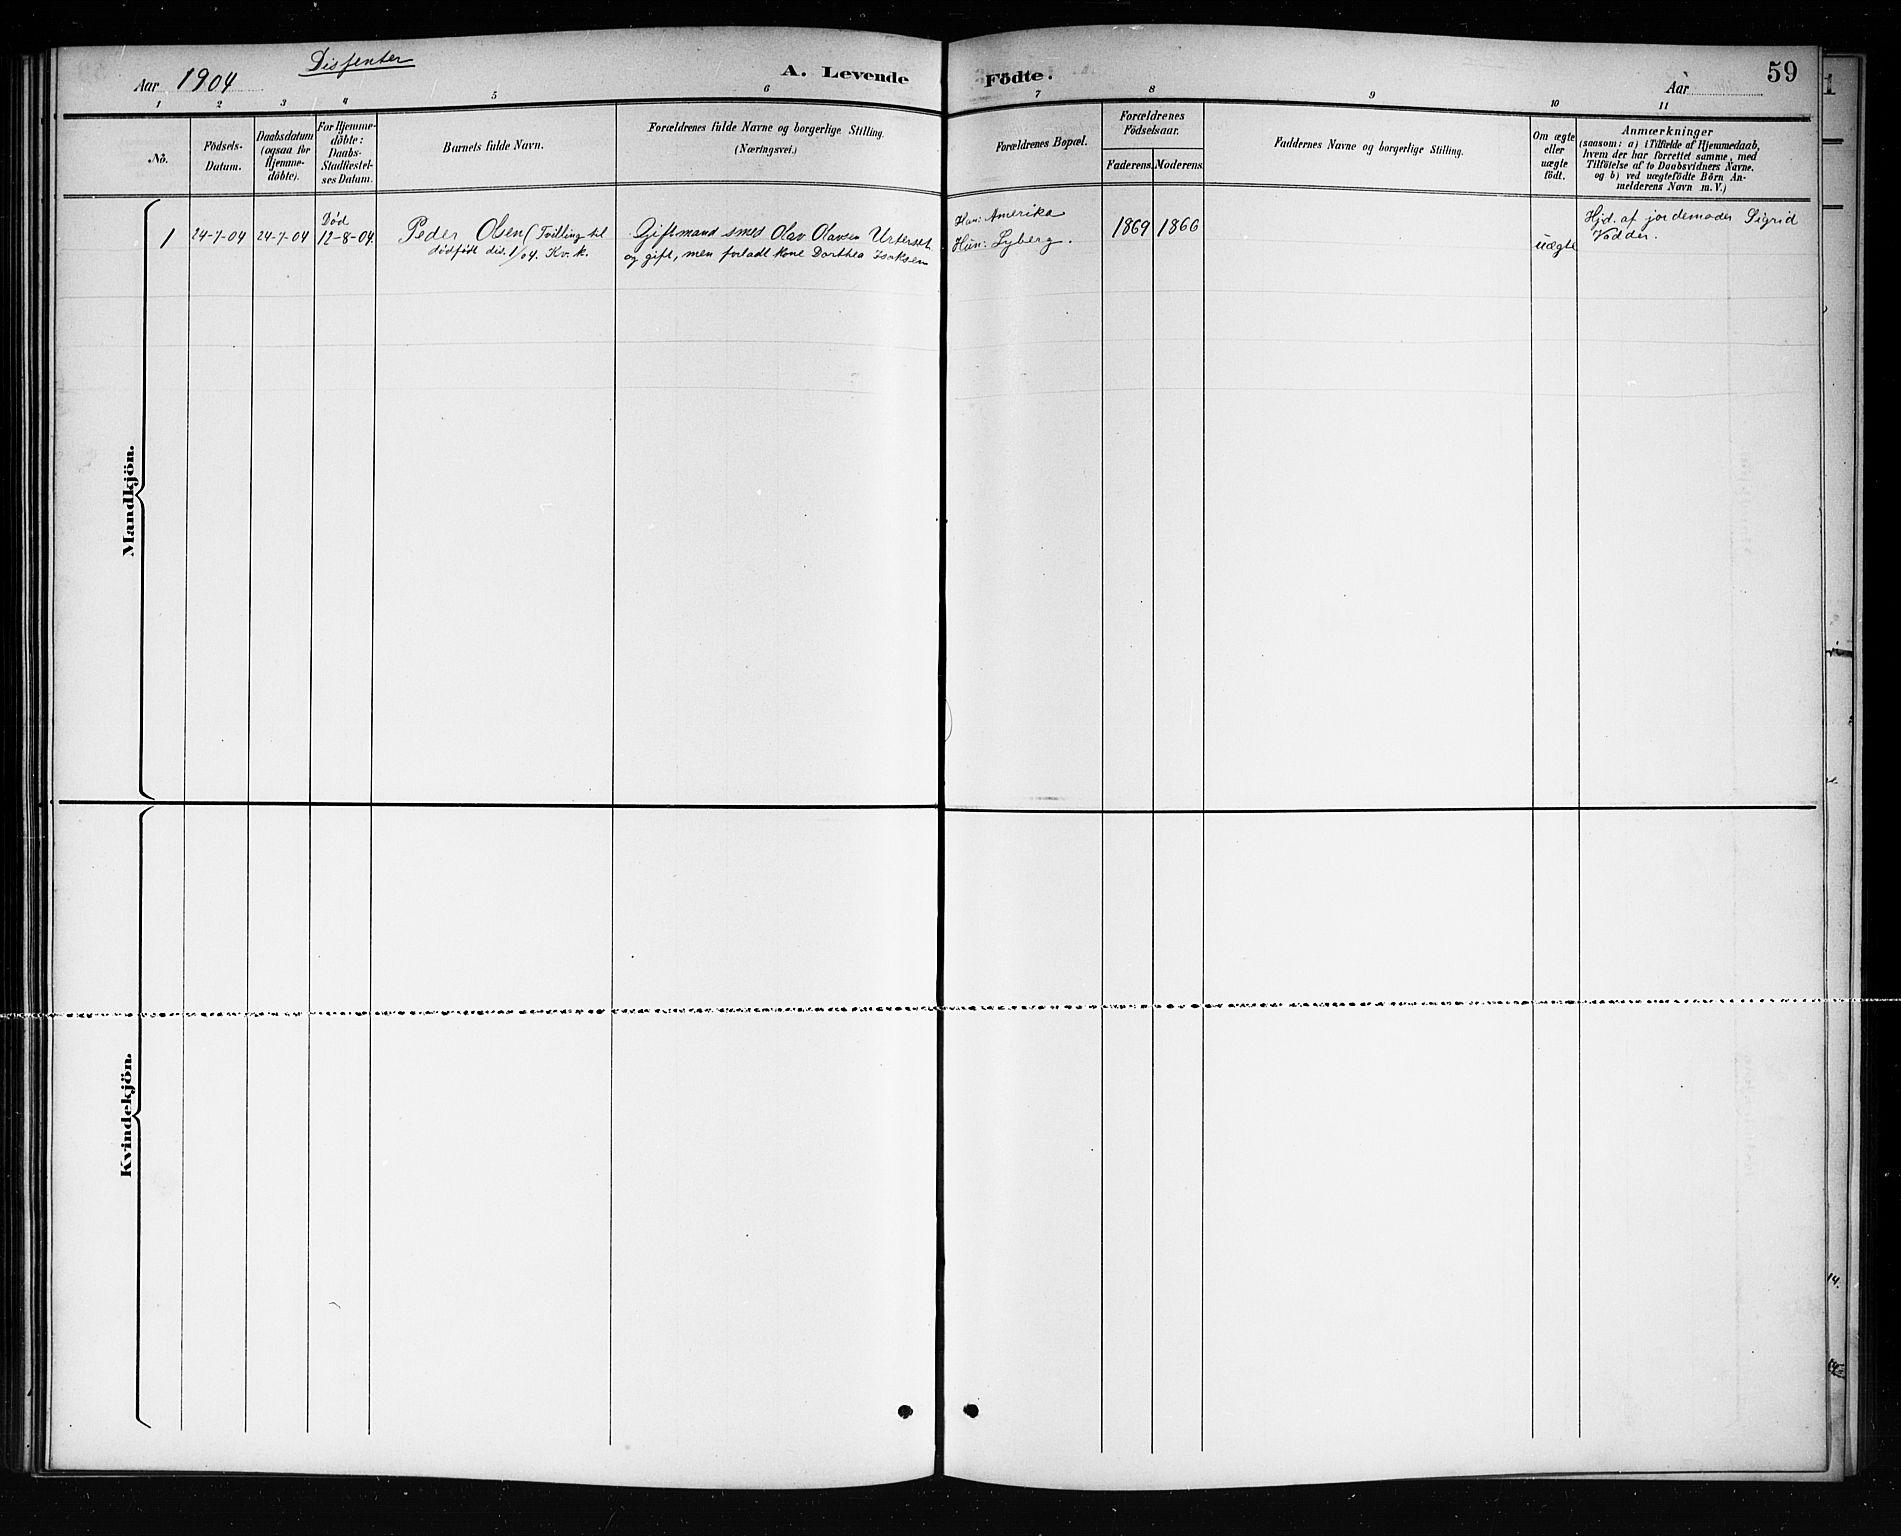 SAKO, Mo kirkebøker, G/Ga/L0002: Klokkerbok nr. I 2, 1892-1914, s. 59